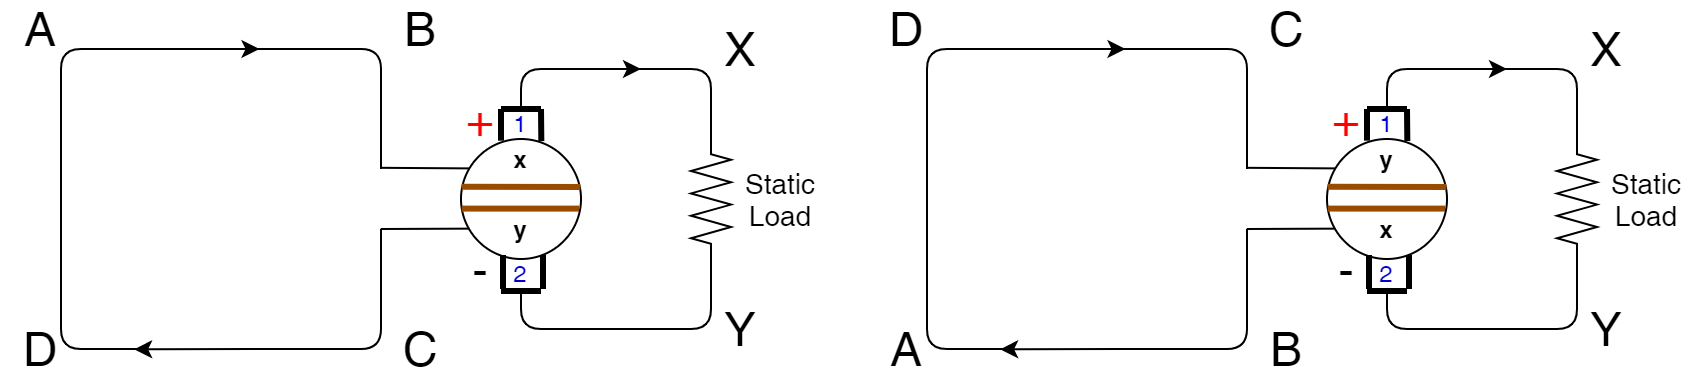 Commutation in dc generator